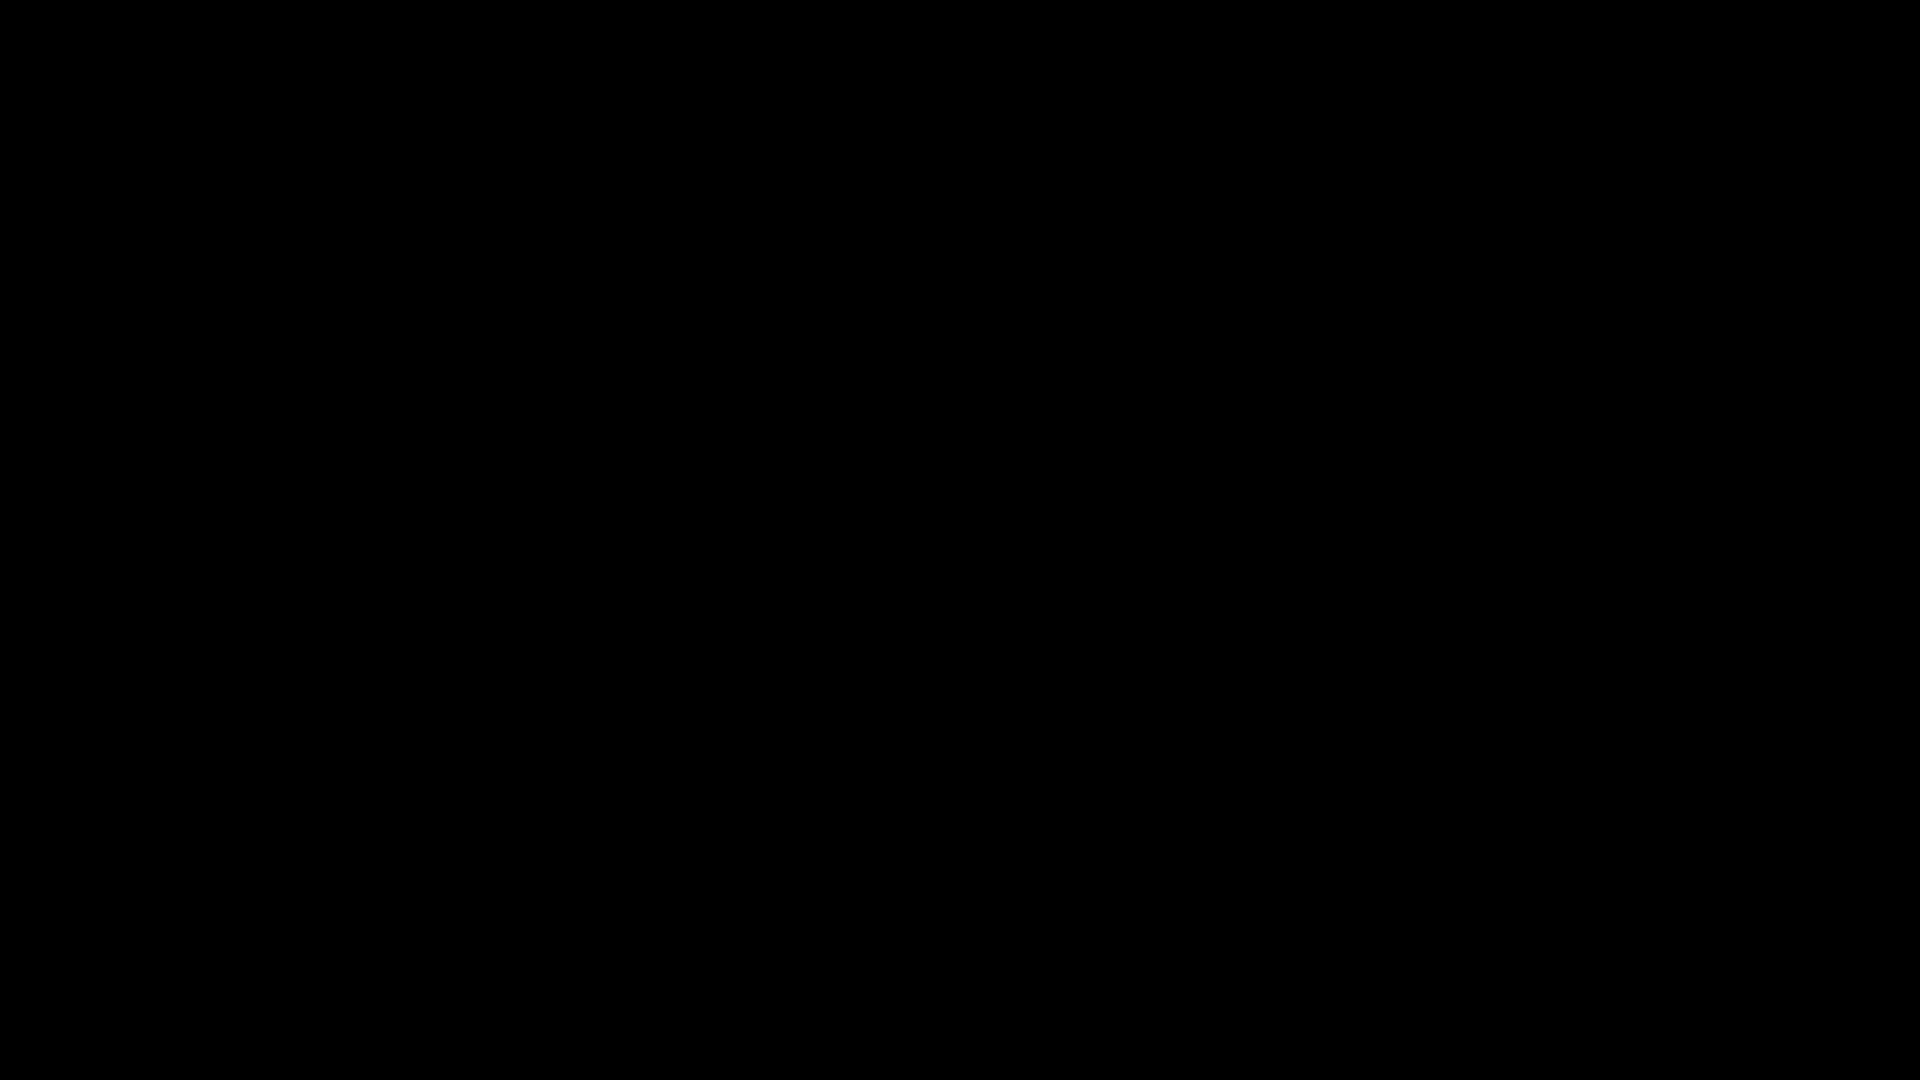 ROCKWOOL support